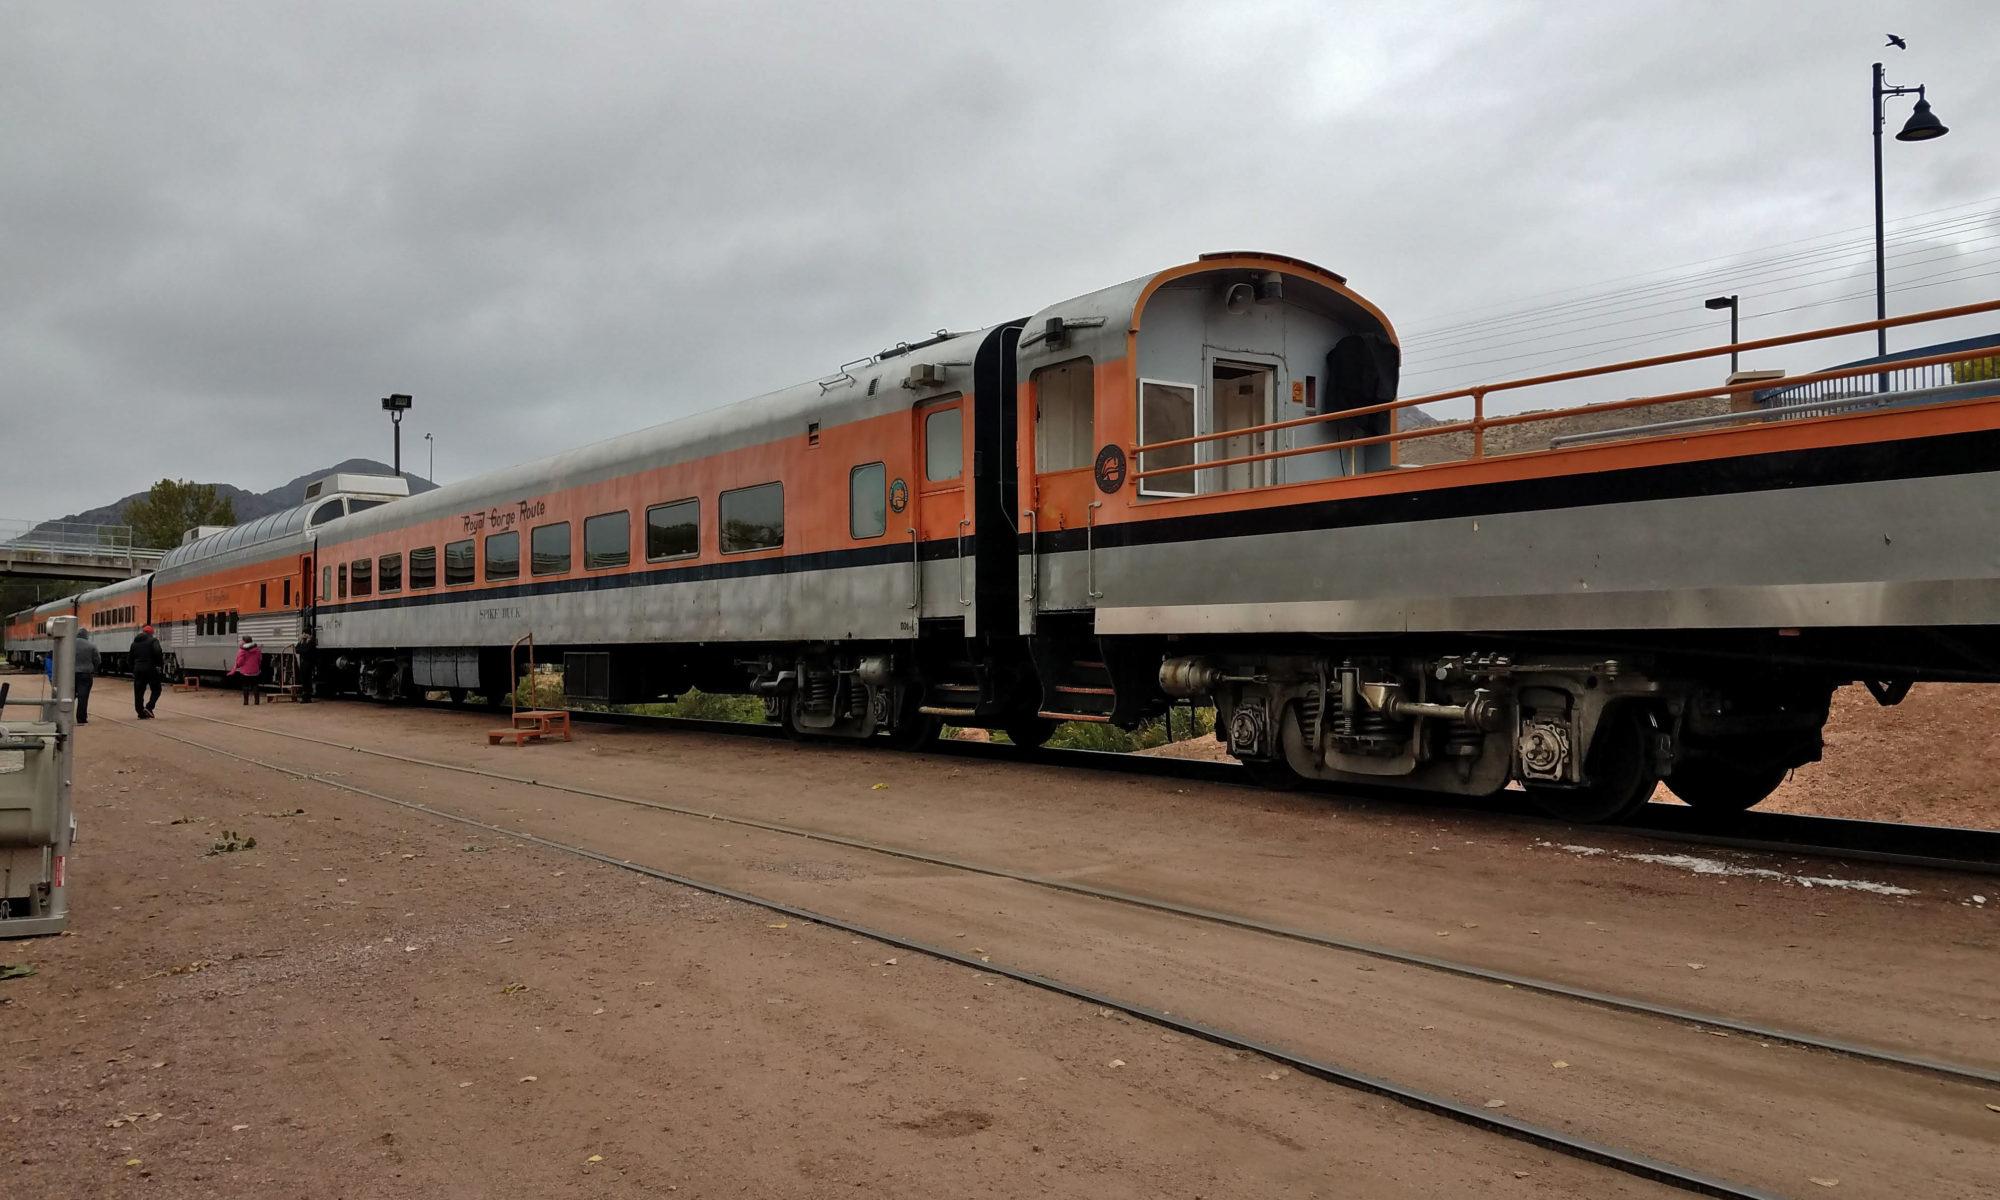 Royal Gorge Railway cars